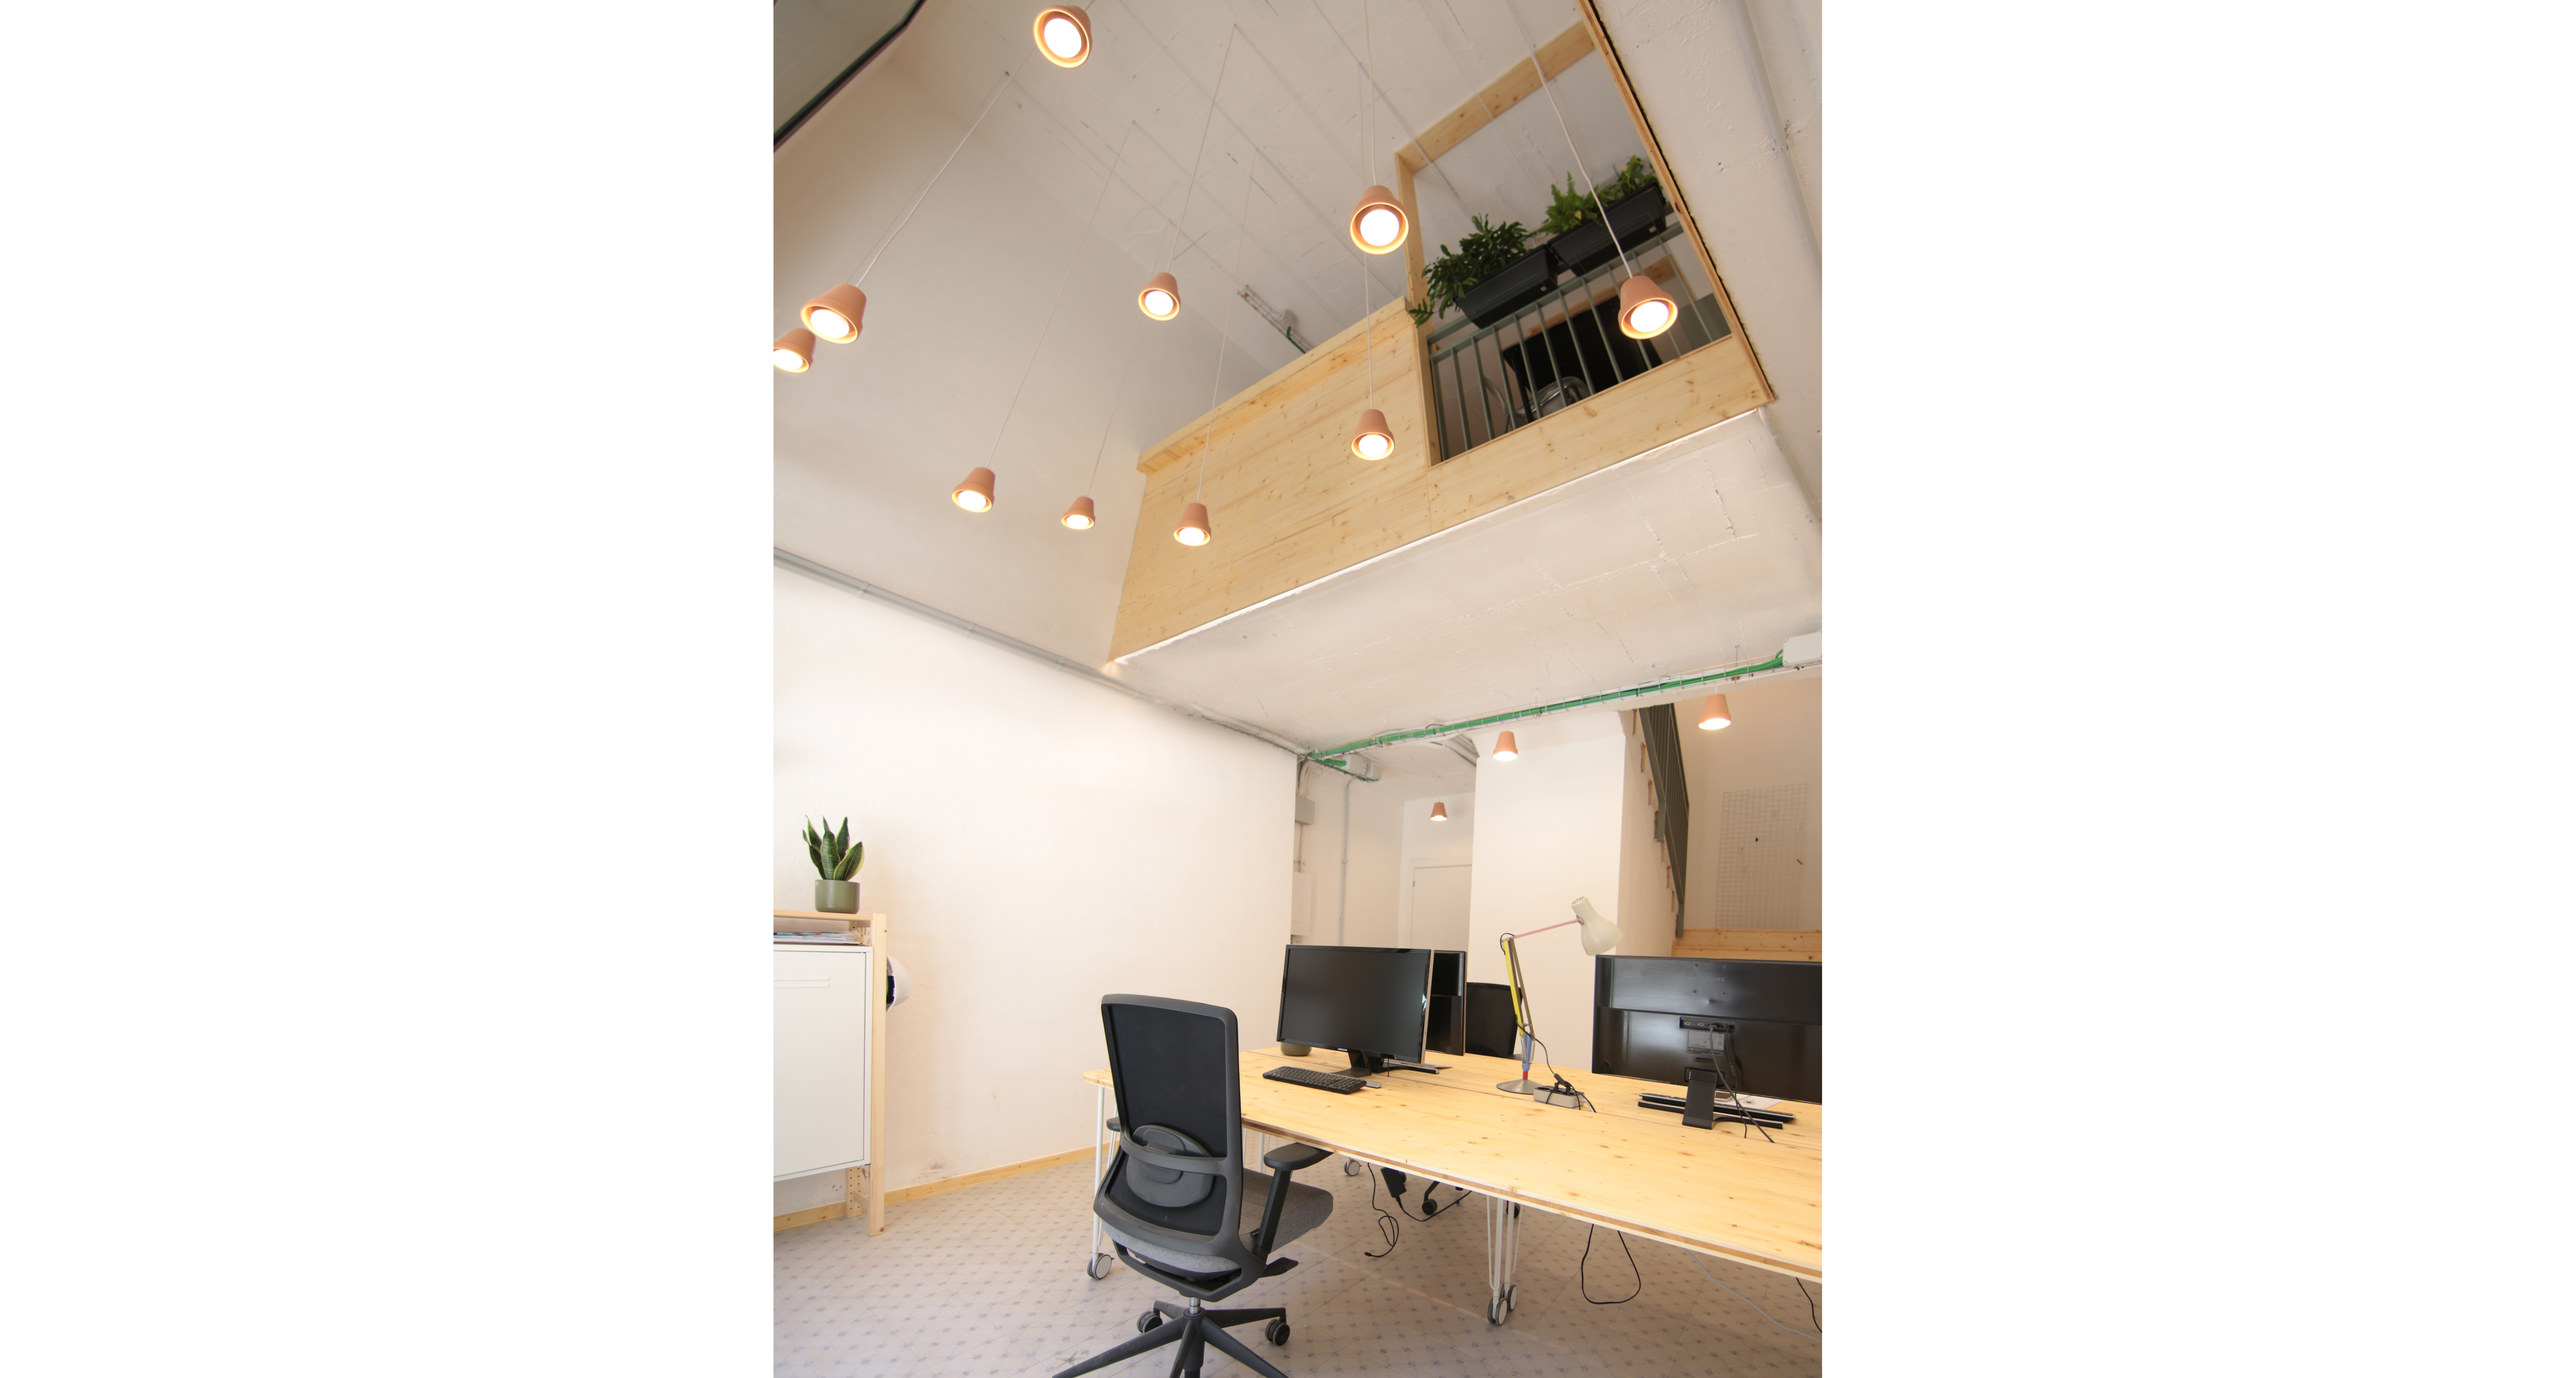 Interiors Saludables